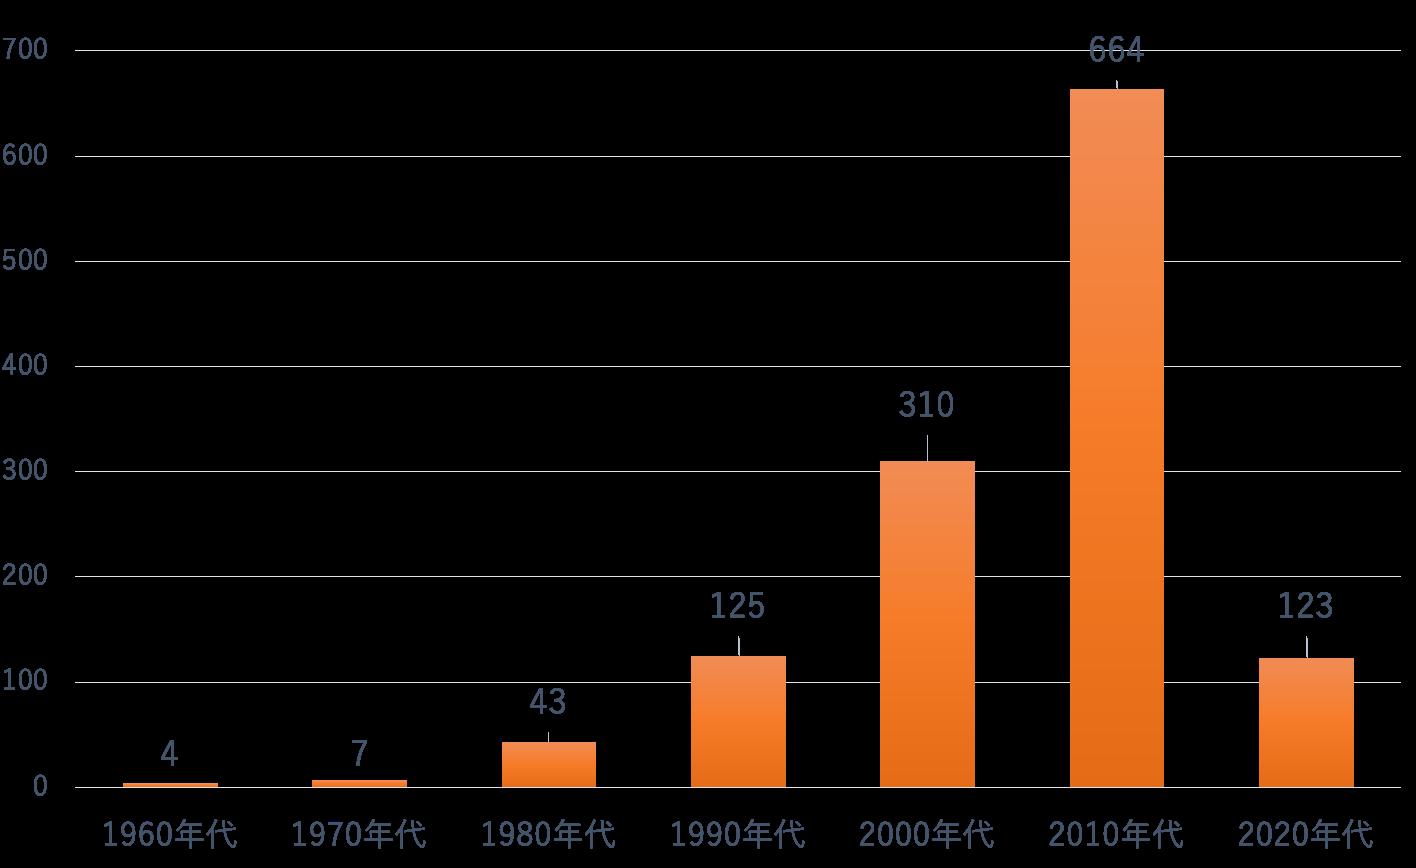 arts-covid19-16-graph.png